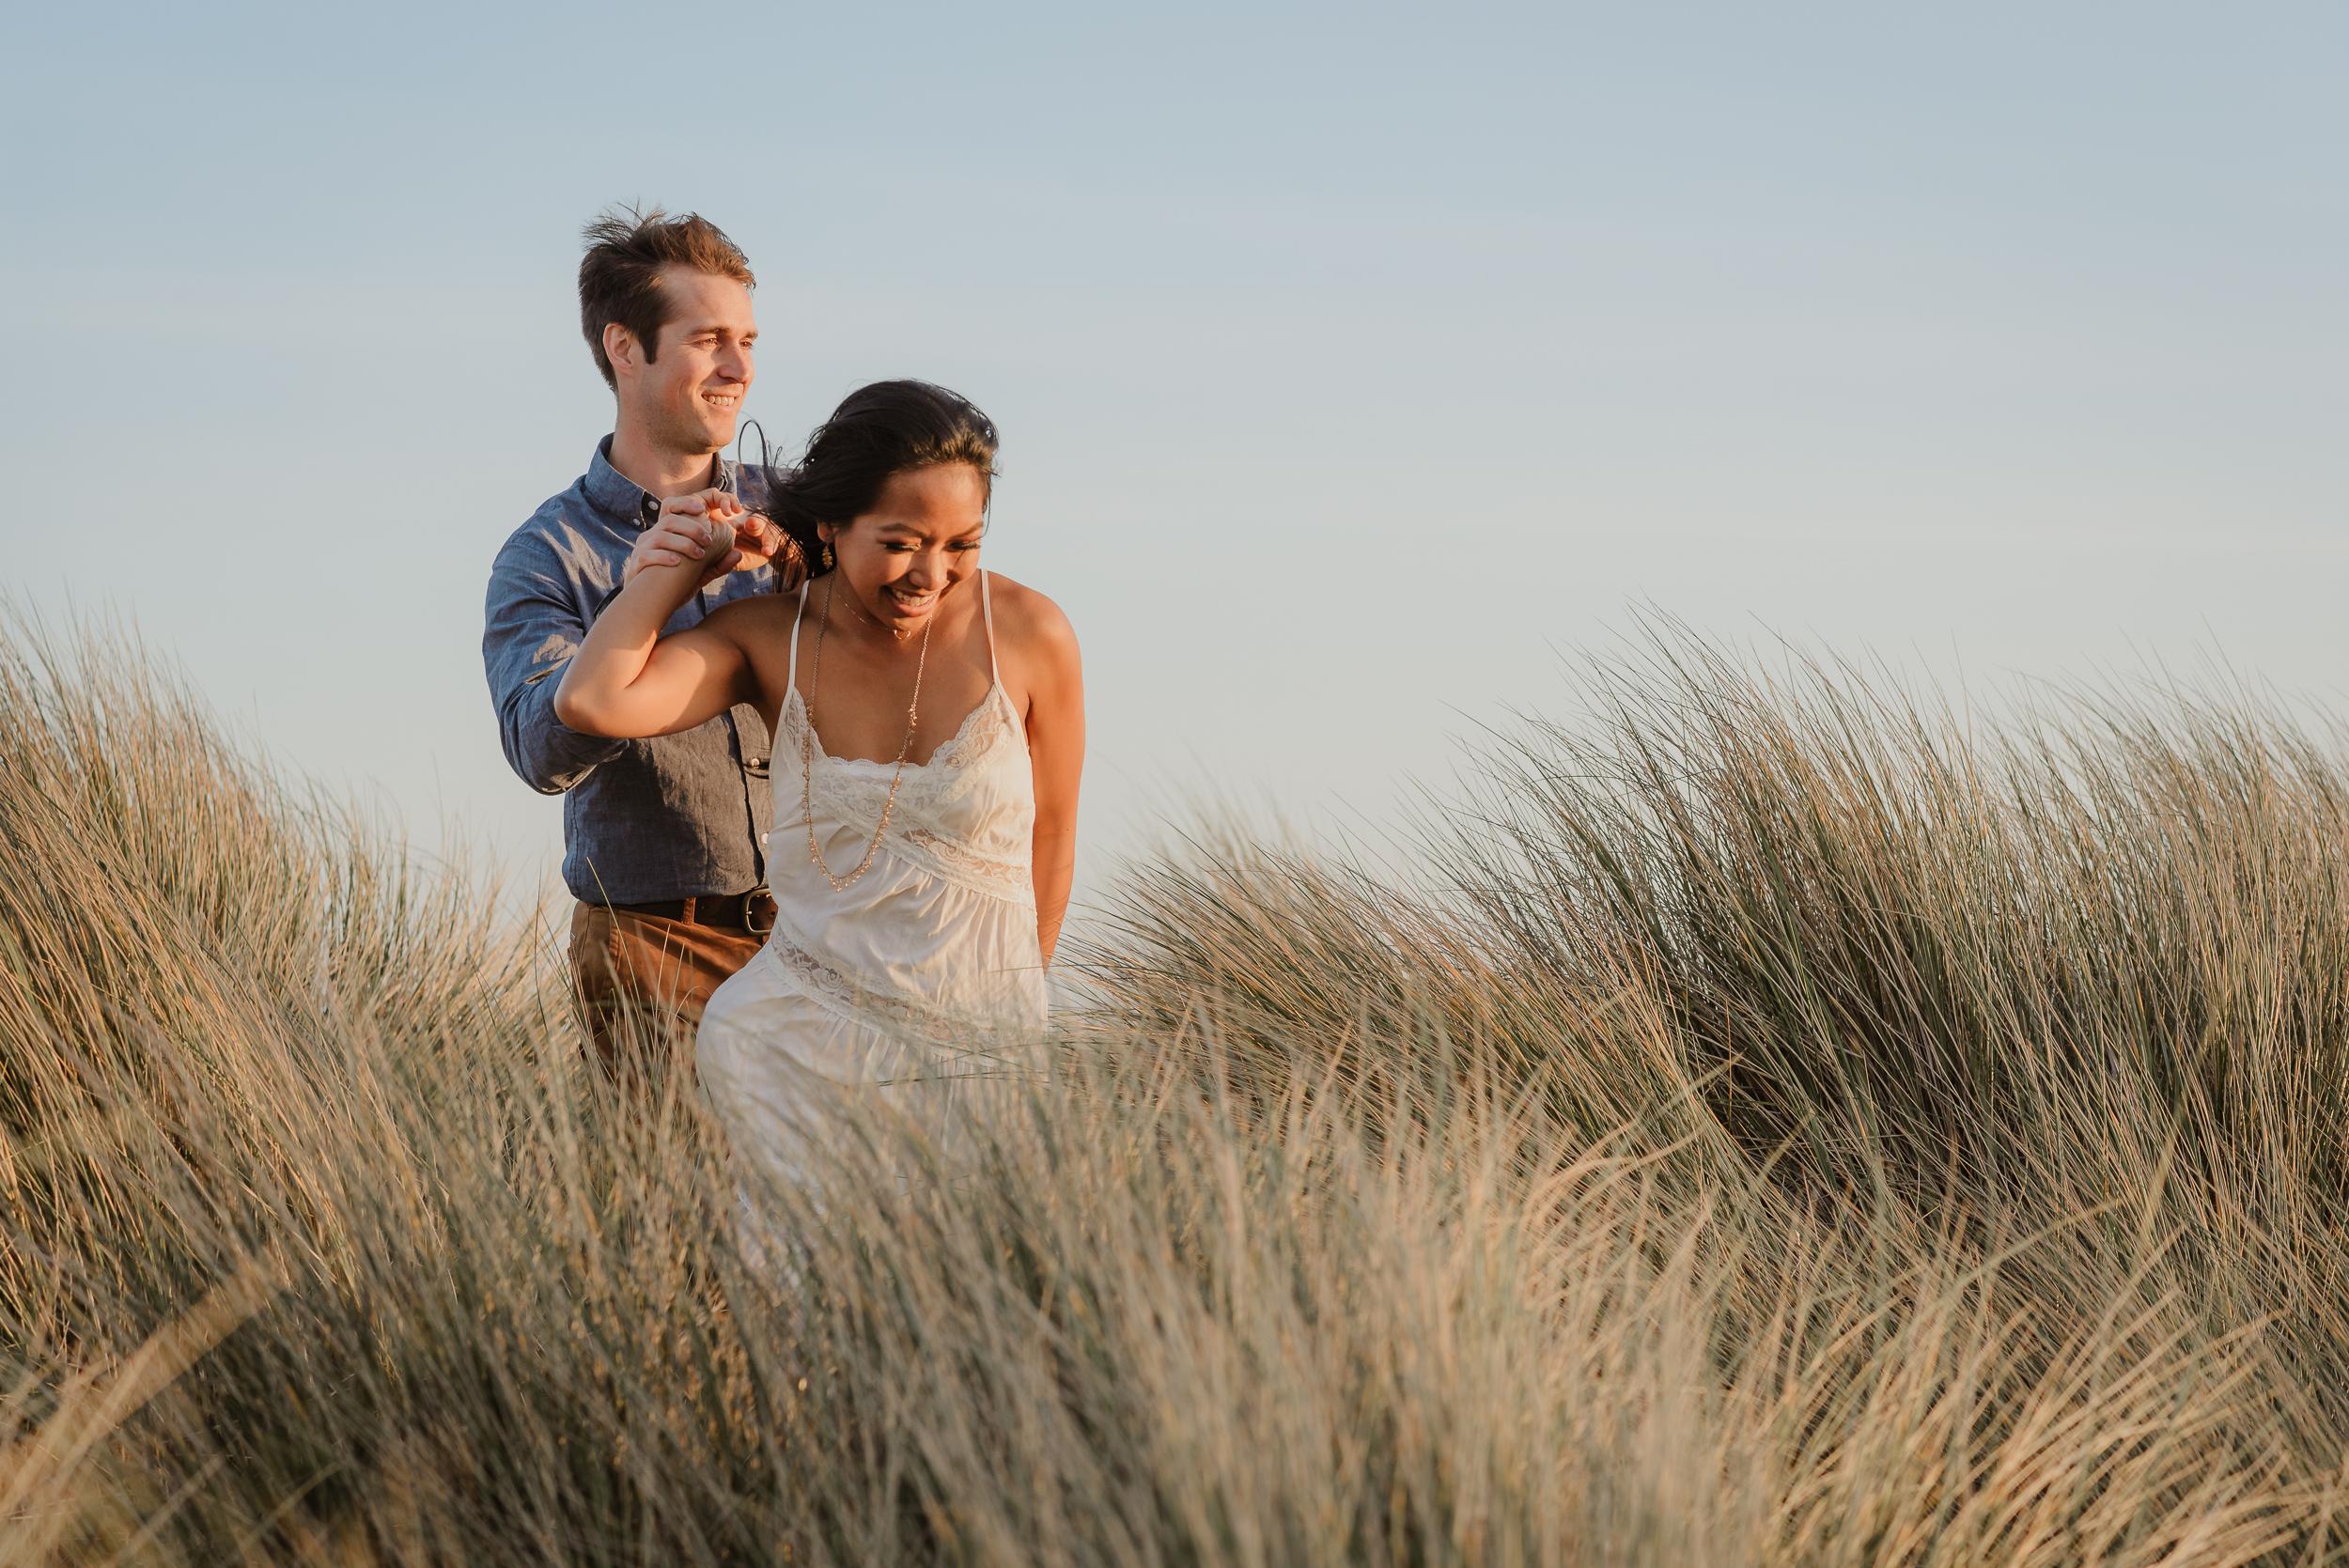 22-point-reyes-national-seashore-engagement-shoot-vivianchen-146.jpg